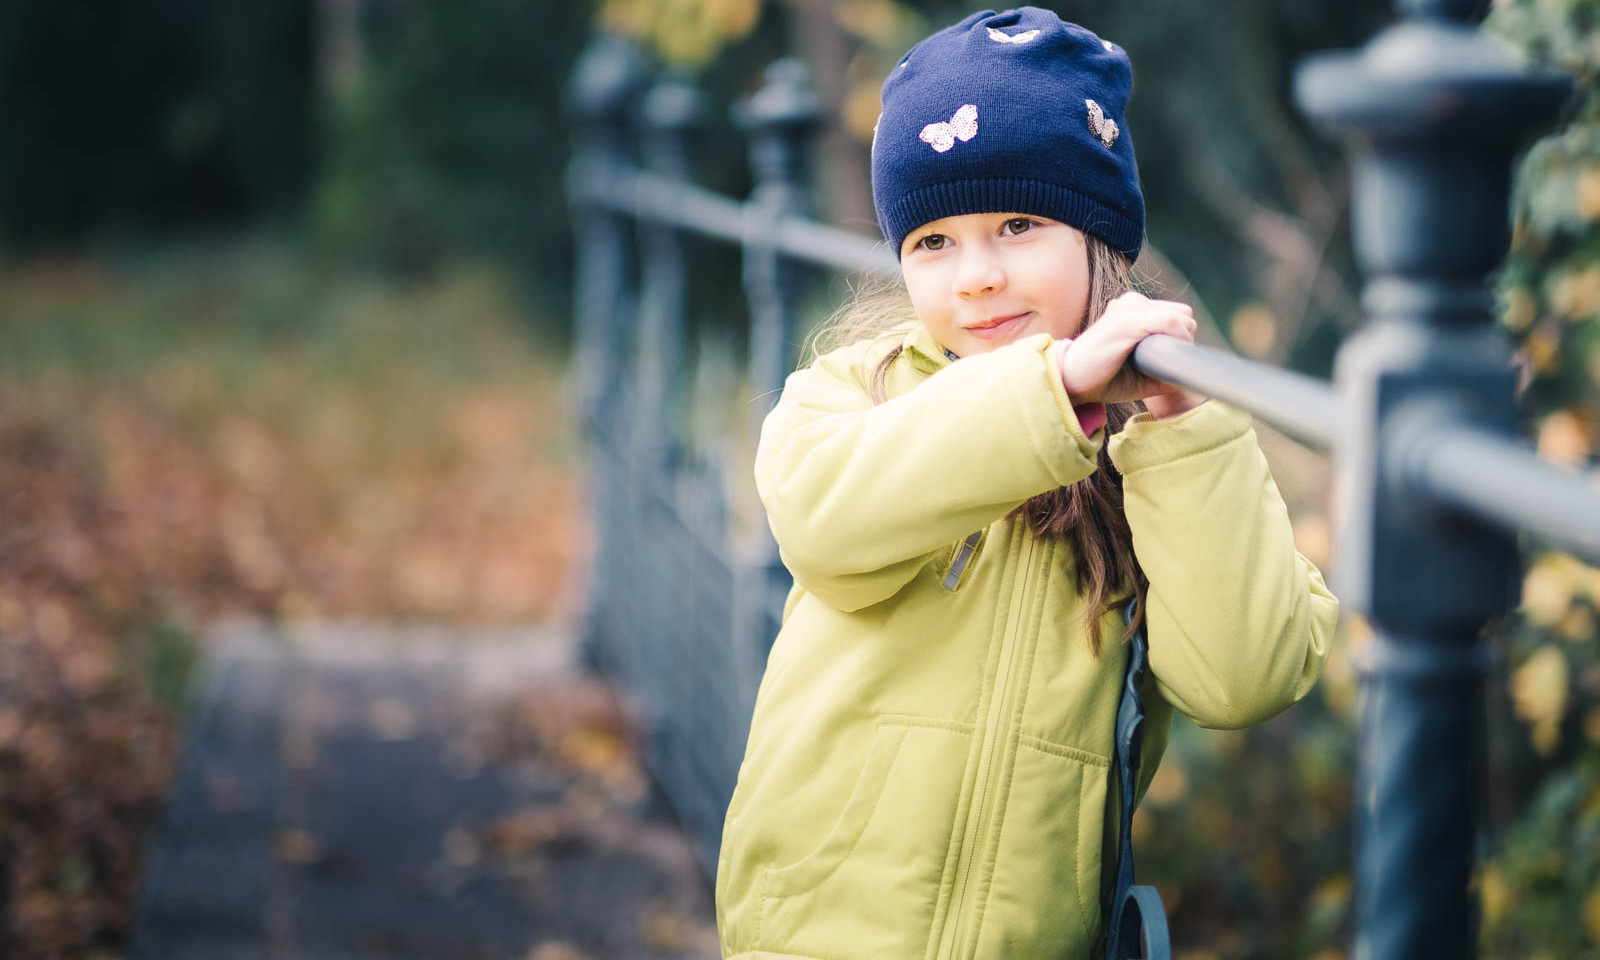 Herbst Familienfotoshooting Wien Tiergarten, Familienfotograf Daniel Wiedner Wien